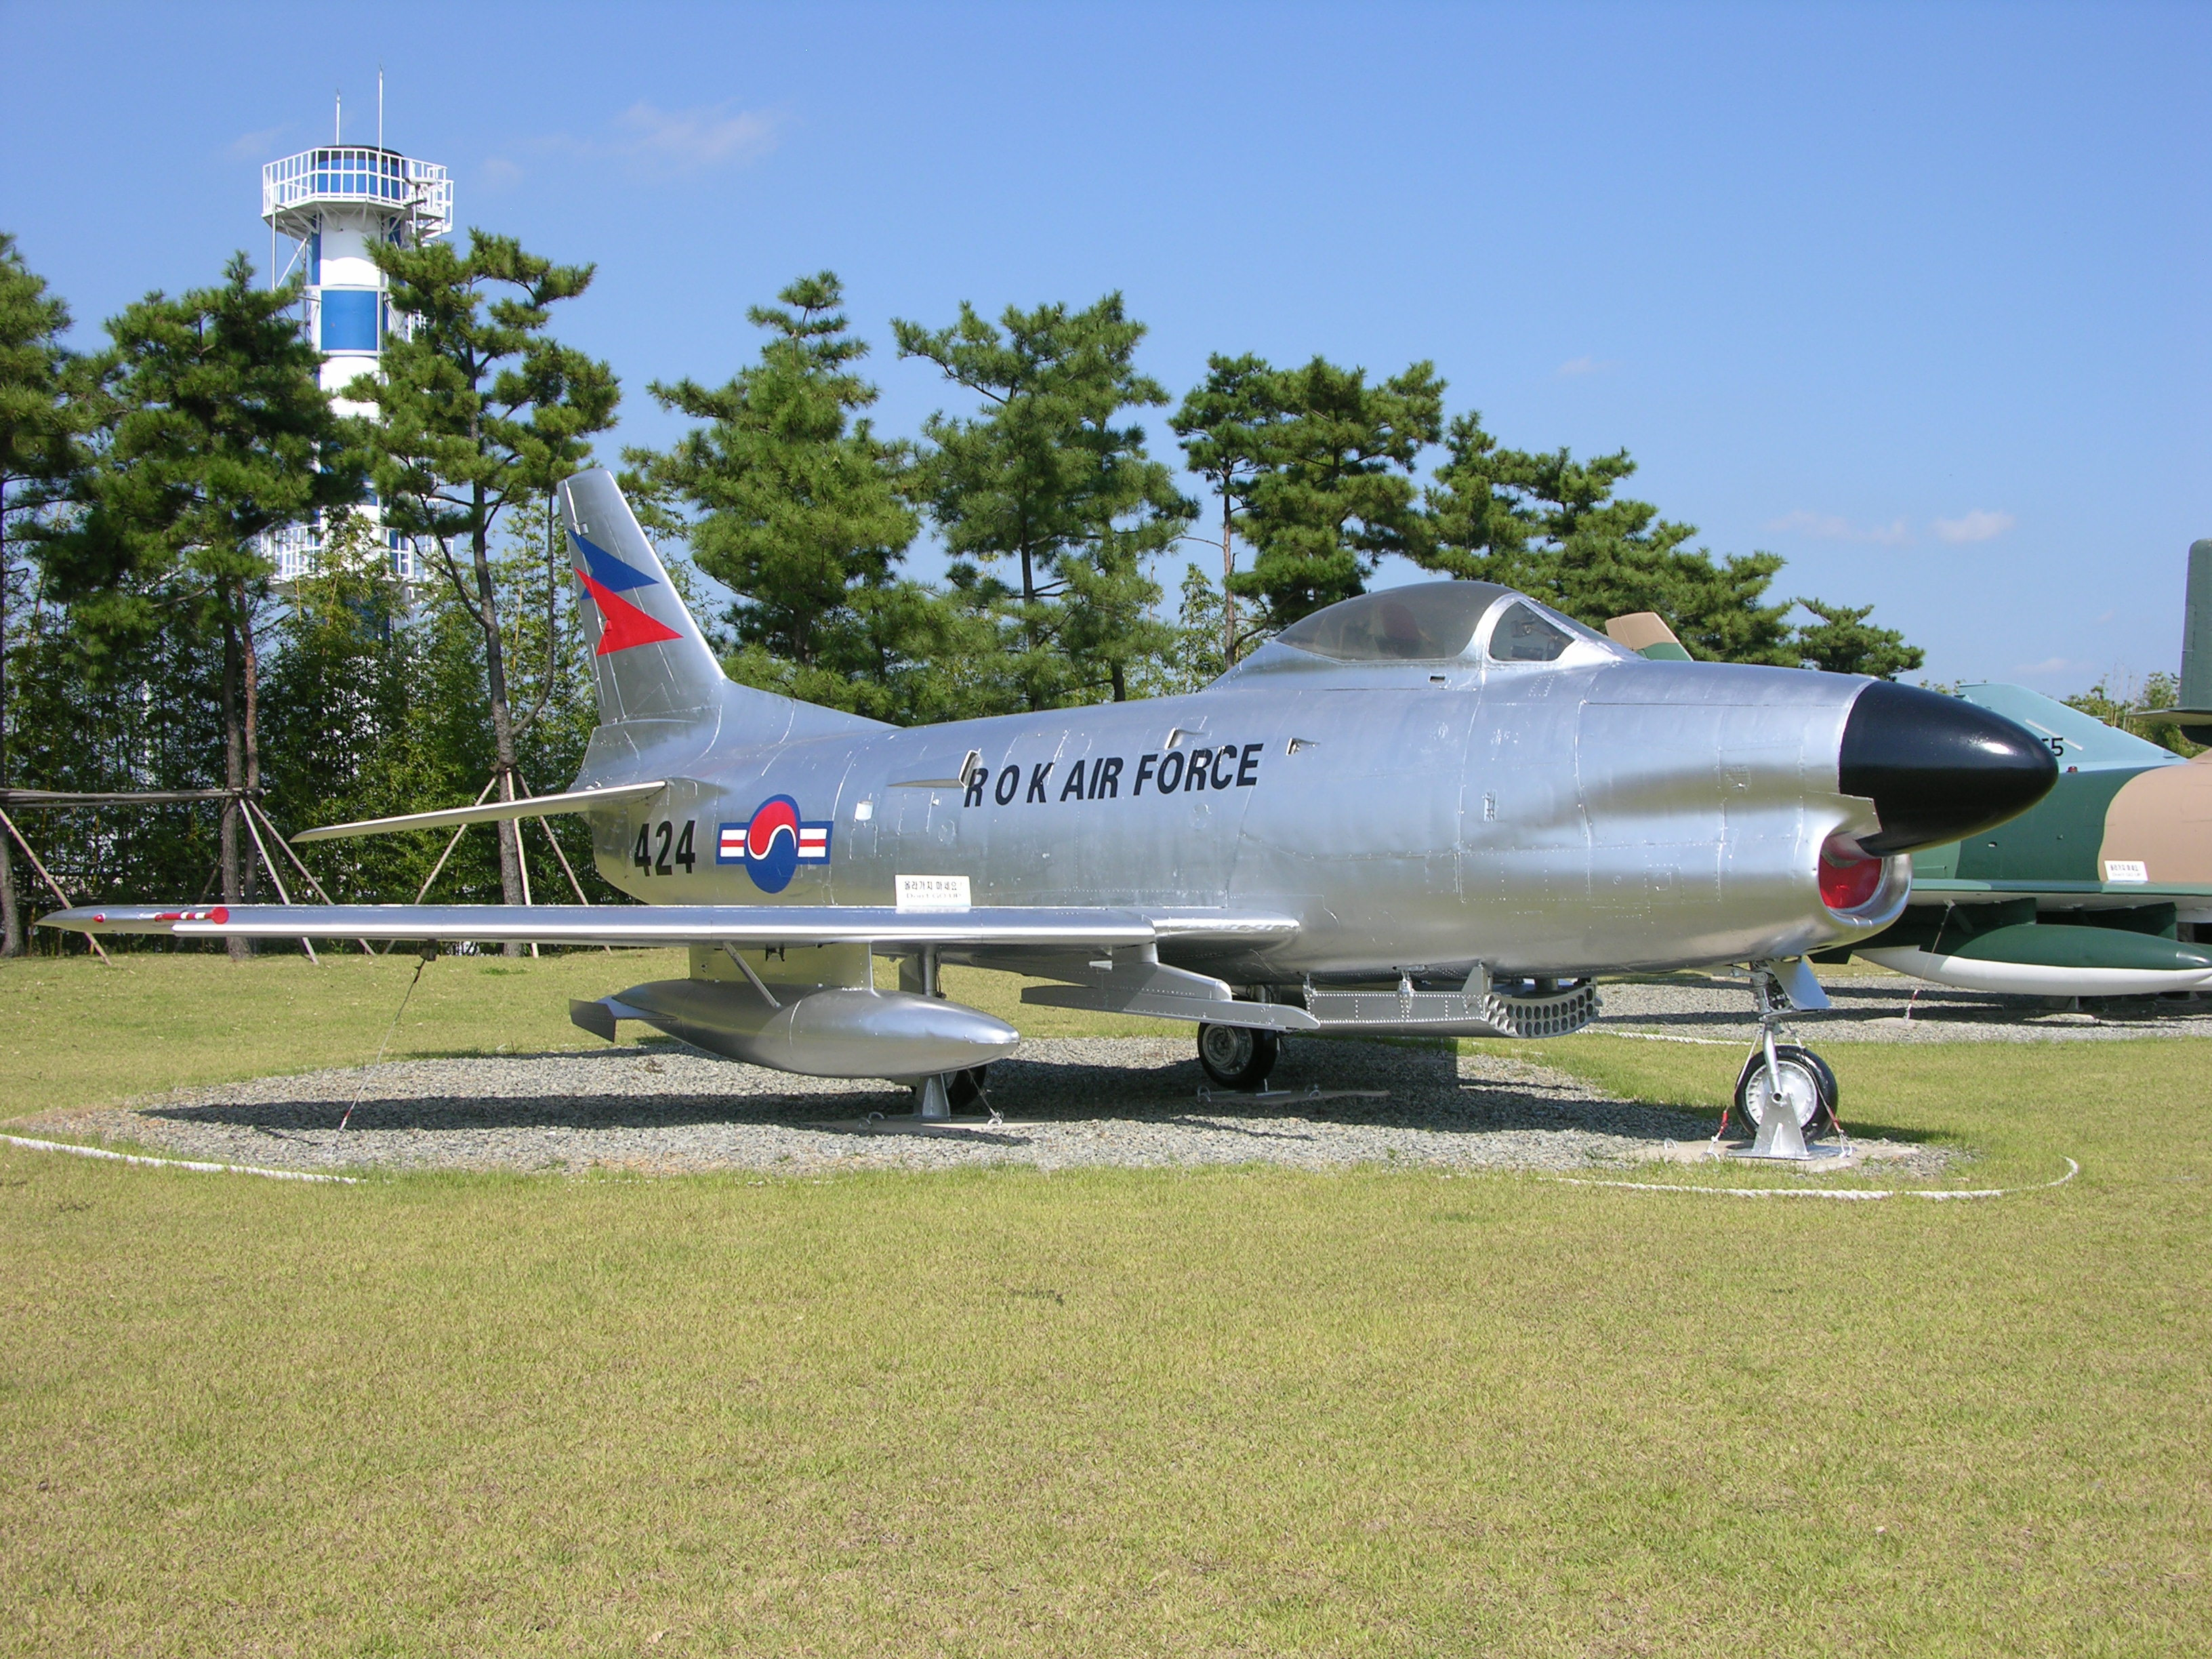 File:424 (51-8424) an F-86D Saber Dog RoKAF (